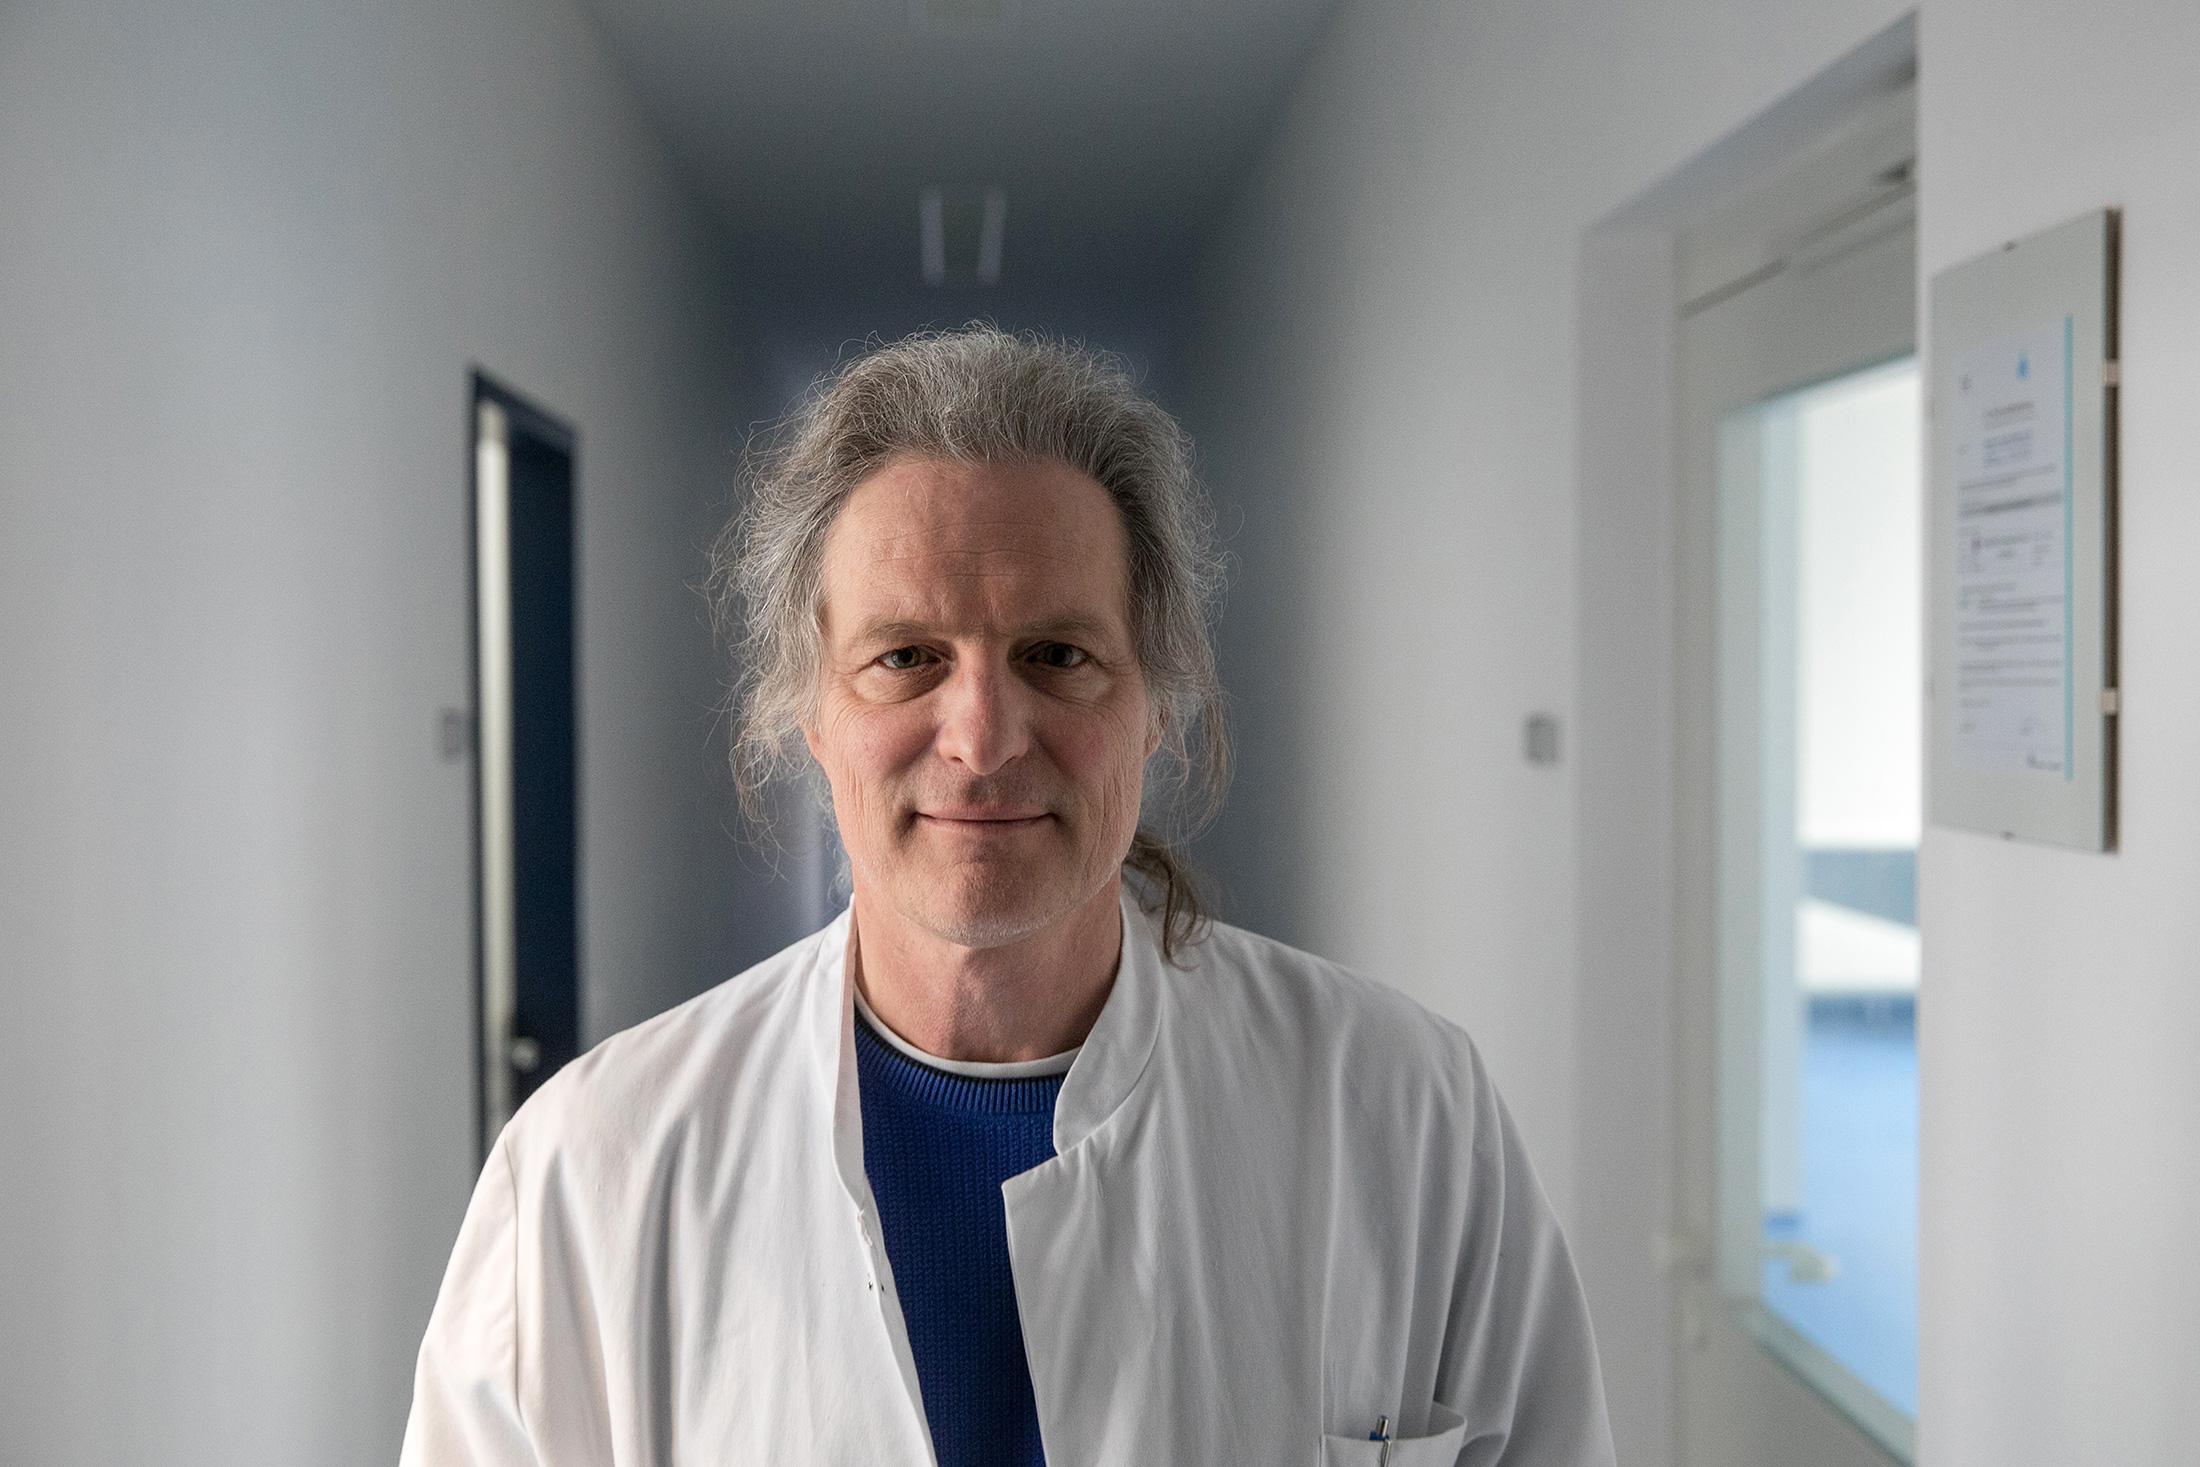 A Berlin Biotech Company Got a Head Start on Coronavirus Tests - Bloomberg